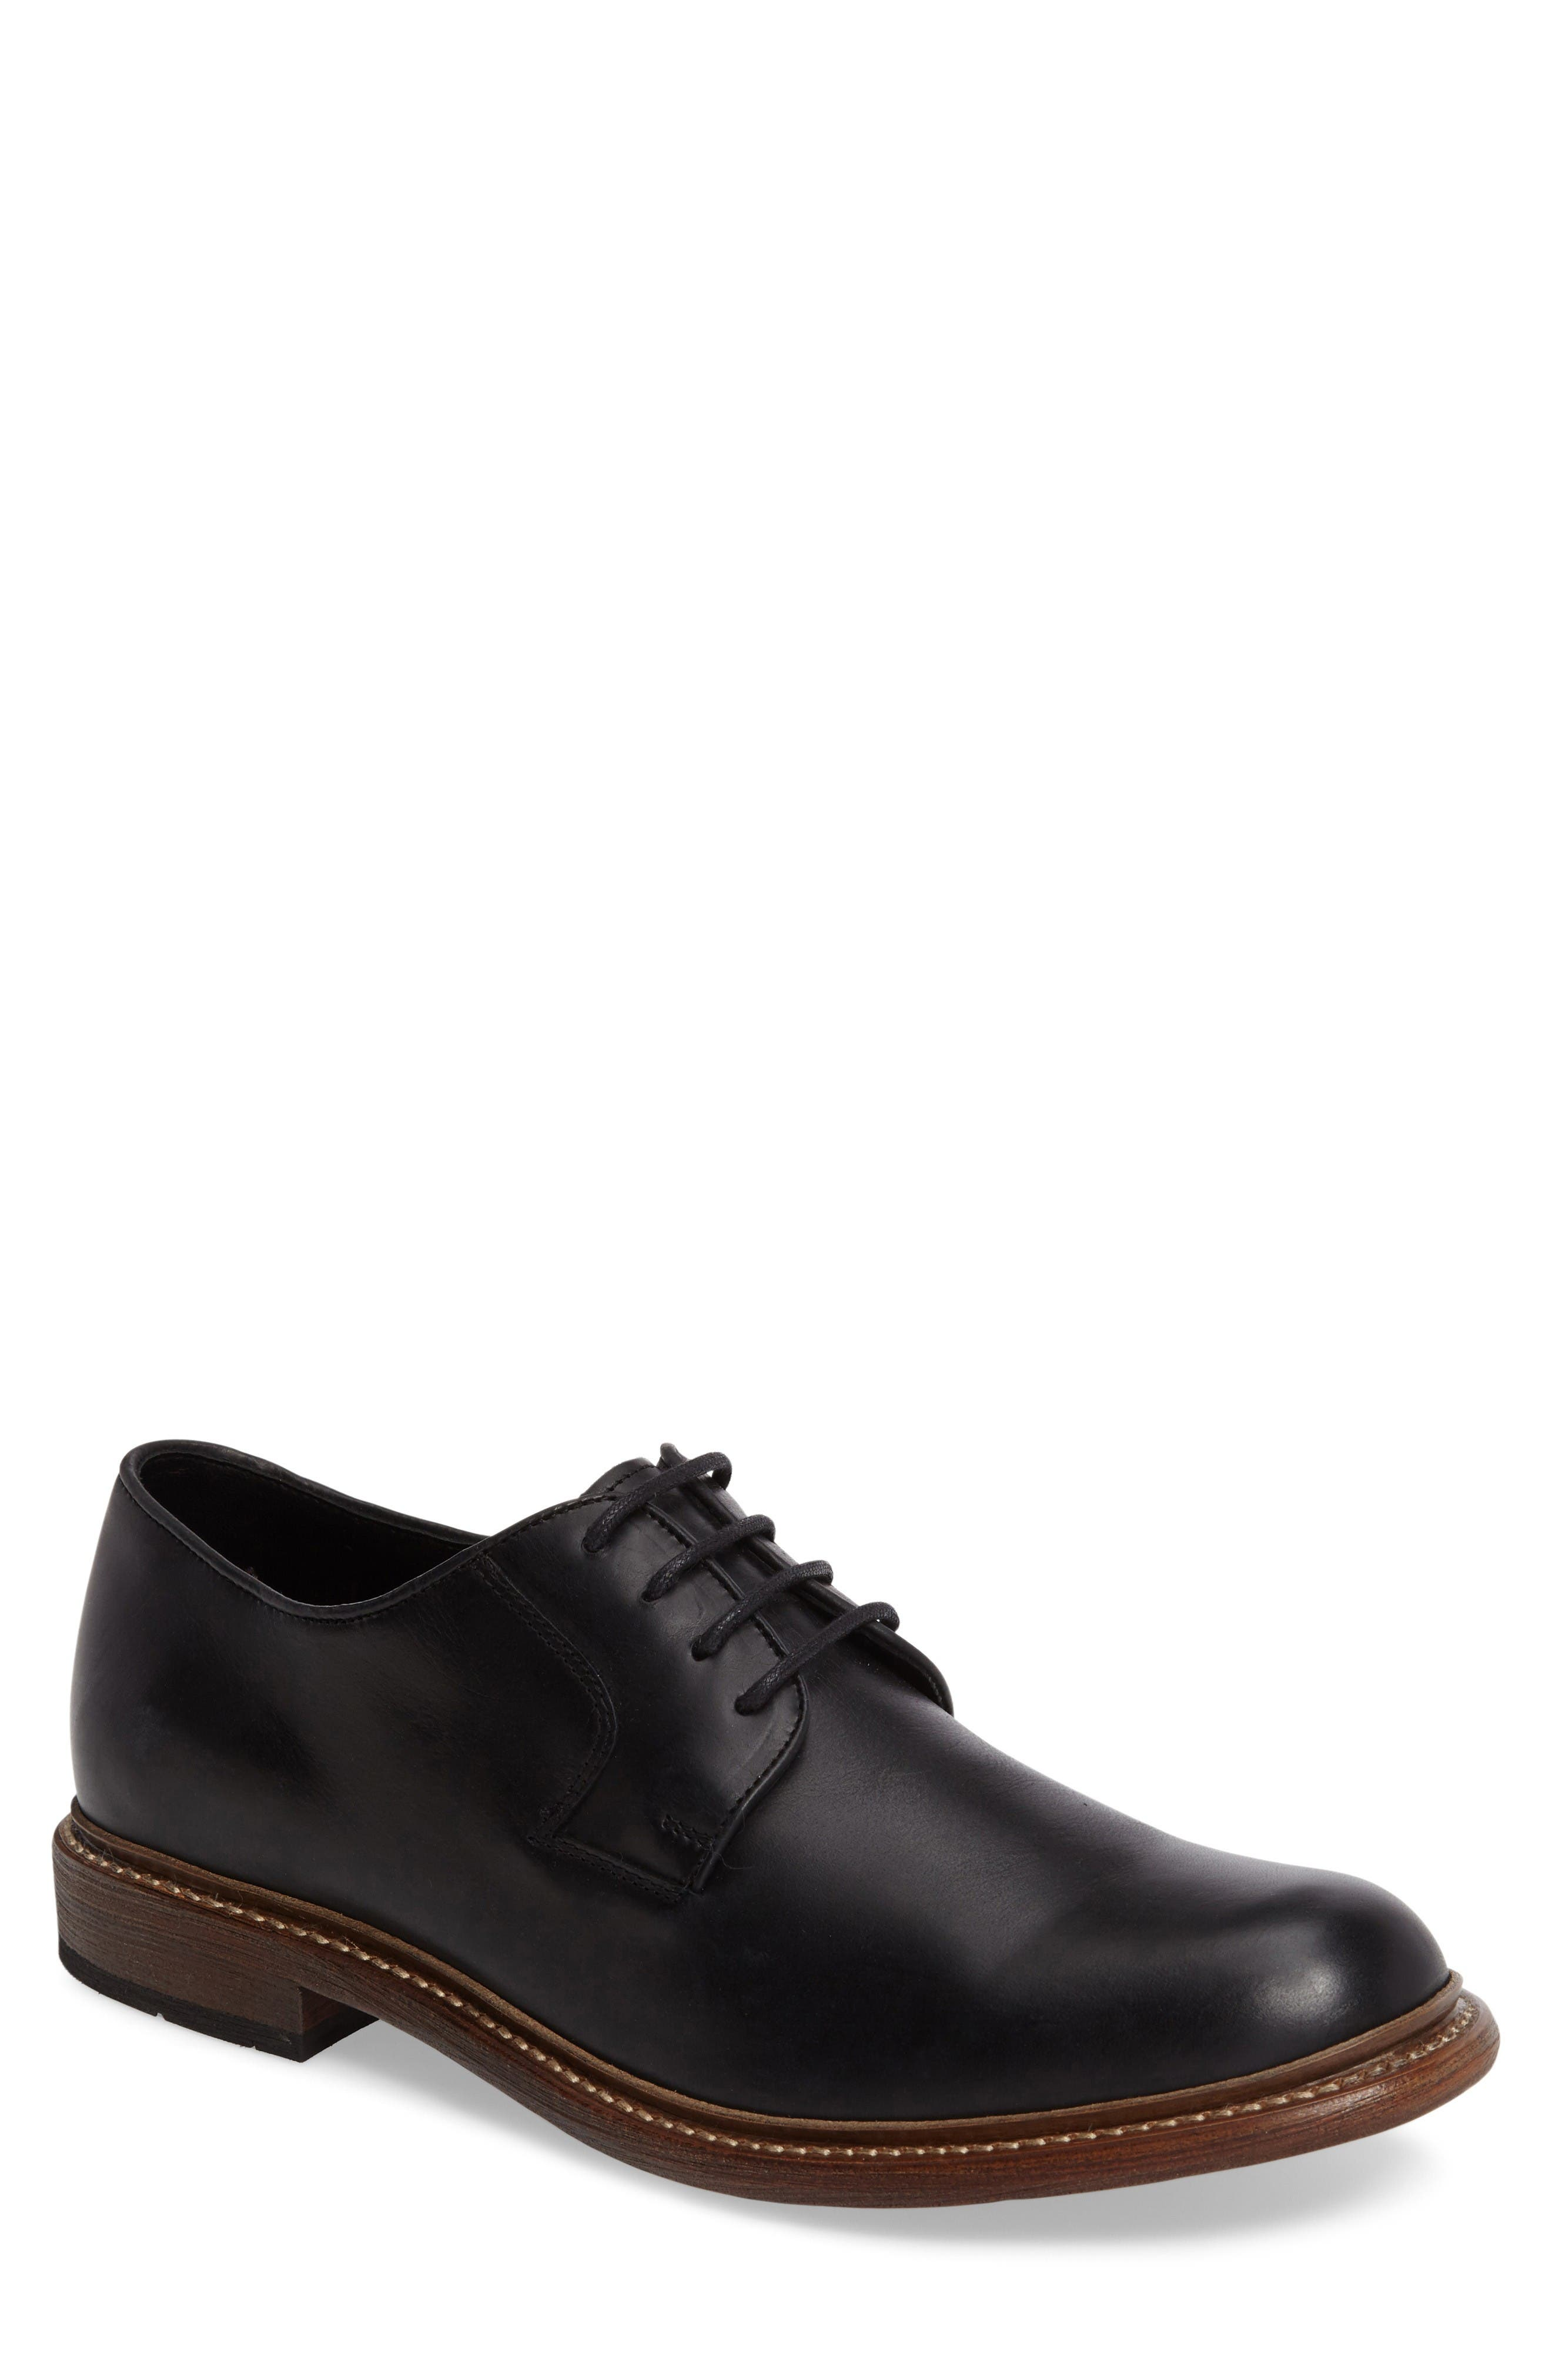 1000 Mile Luke Plain Toe Derby,                         Main,                         color, Black Leather